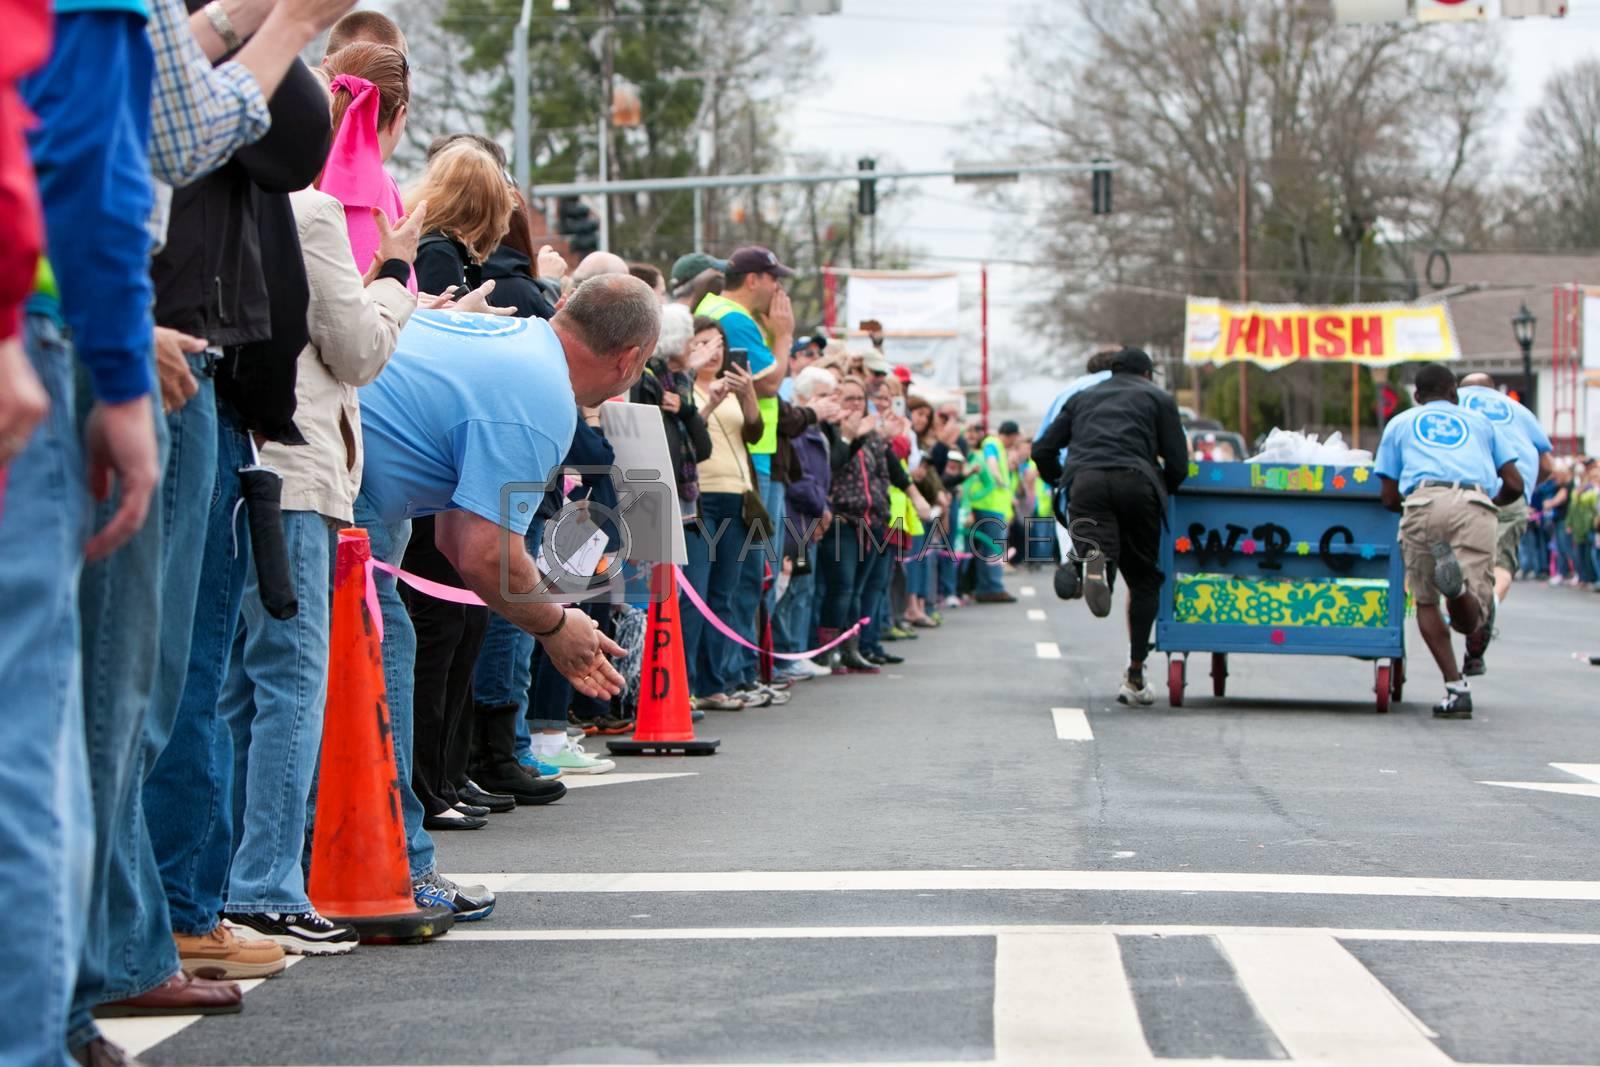 Royalty free image of Spectators Cheer Team Pushing Bed Toward Finish Of Fundraiser Ra by BluIz60